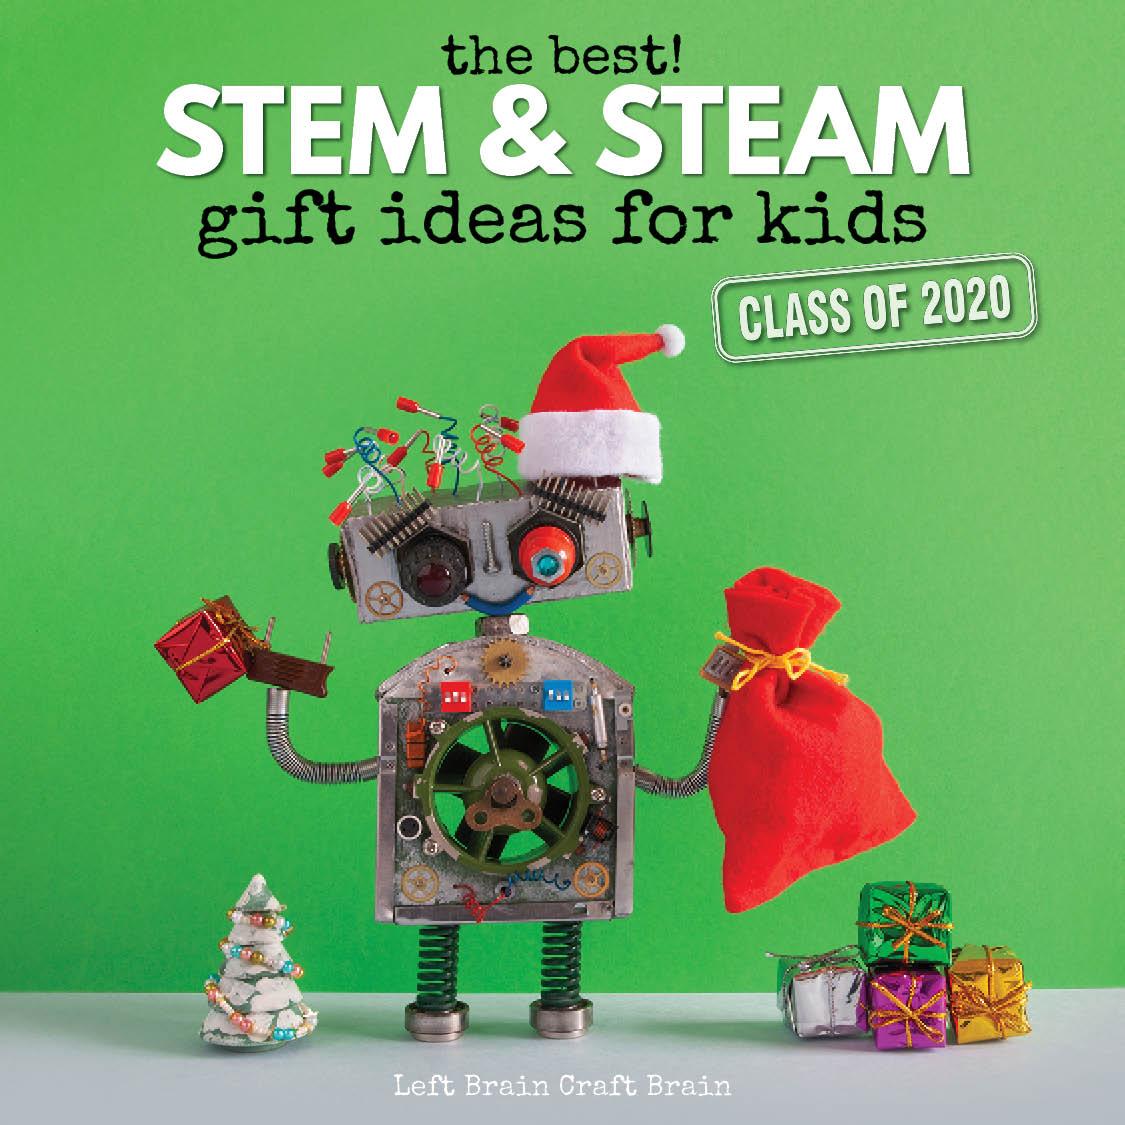 2020 STEM & STEAM Gift Ideas for Kids 1000x1000